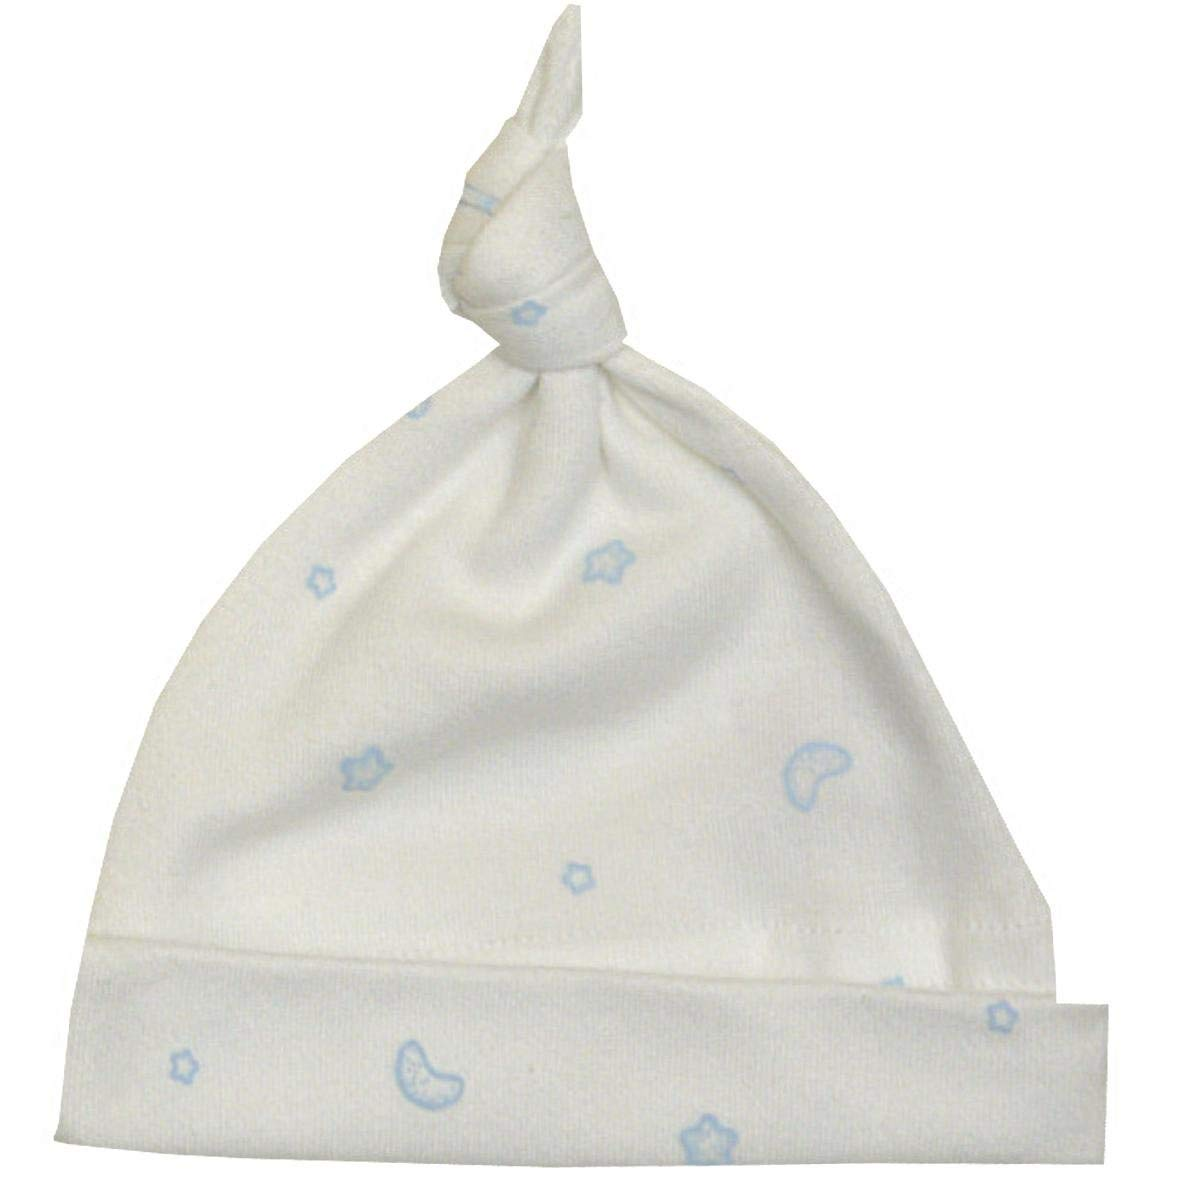 Get Quotations · Premature Baby Clothes Boys Knotted Hat 1.5lb - 7.5lb  VARIOUS BLUE DESIGNS 35c11c352aa6